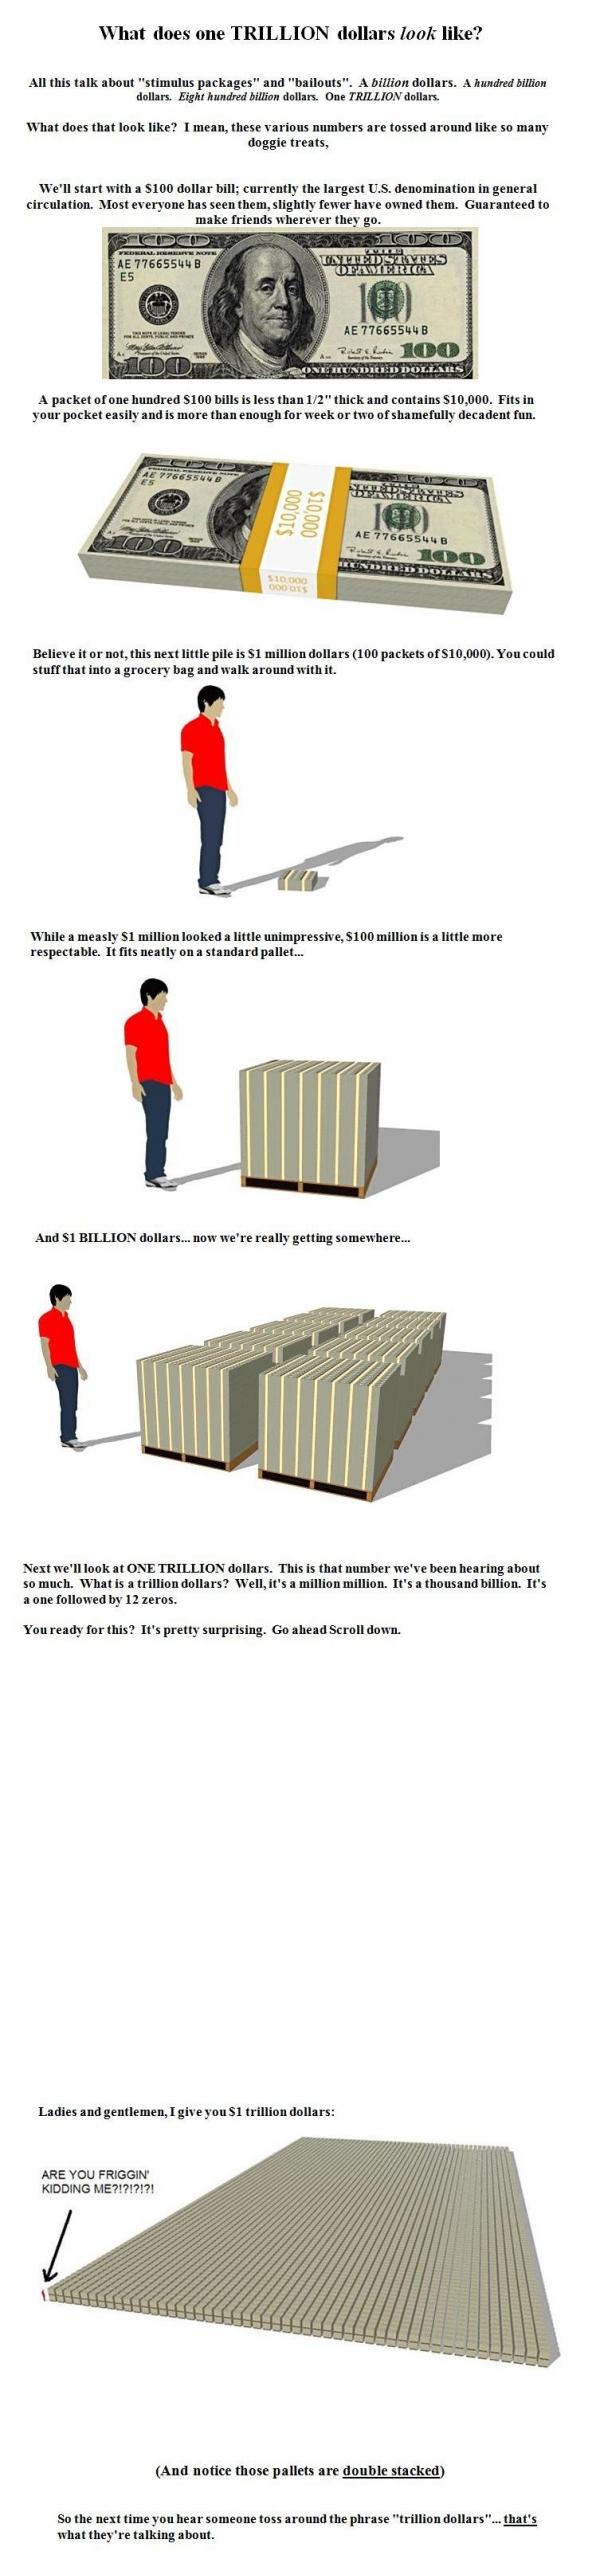 Trillion Dollar Infographic